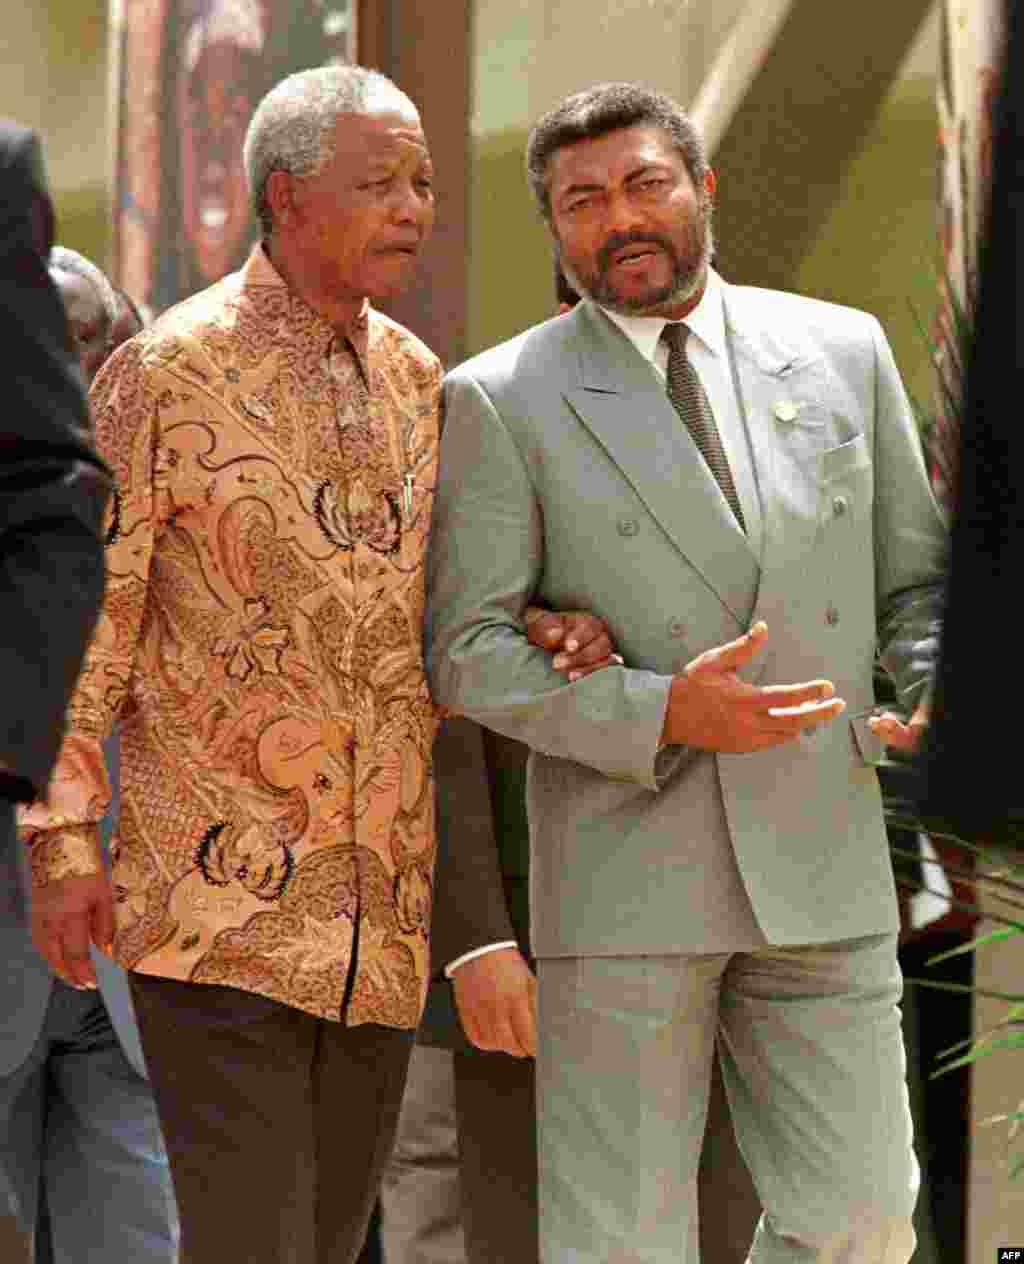 Marais Nelson Mandela wa Afrika Kusini na Jerry Rawlings wa Ghana mjini Ouagadougou kwenye mkutano wa OAU